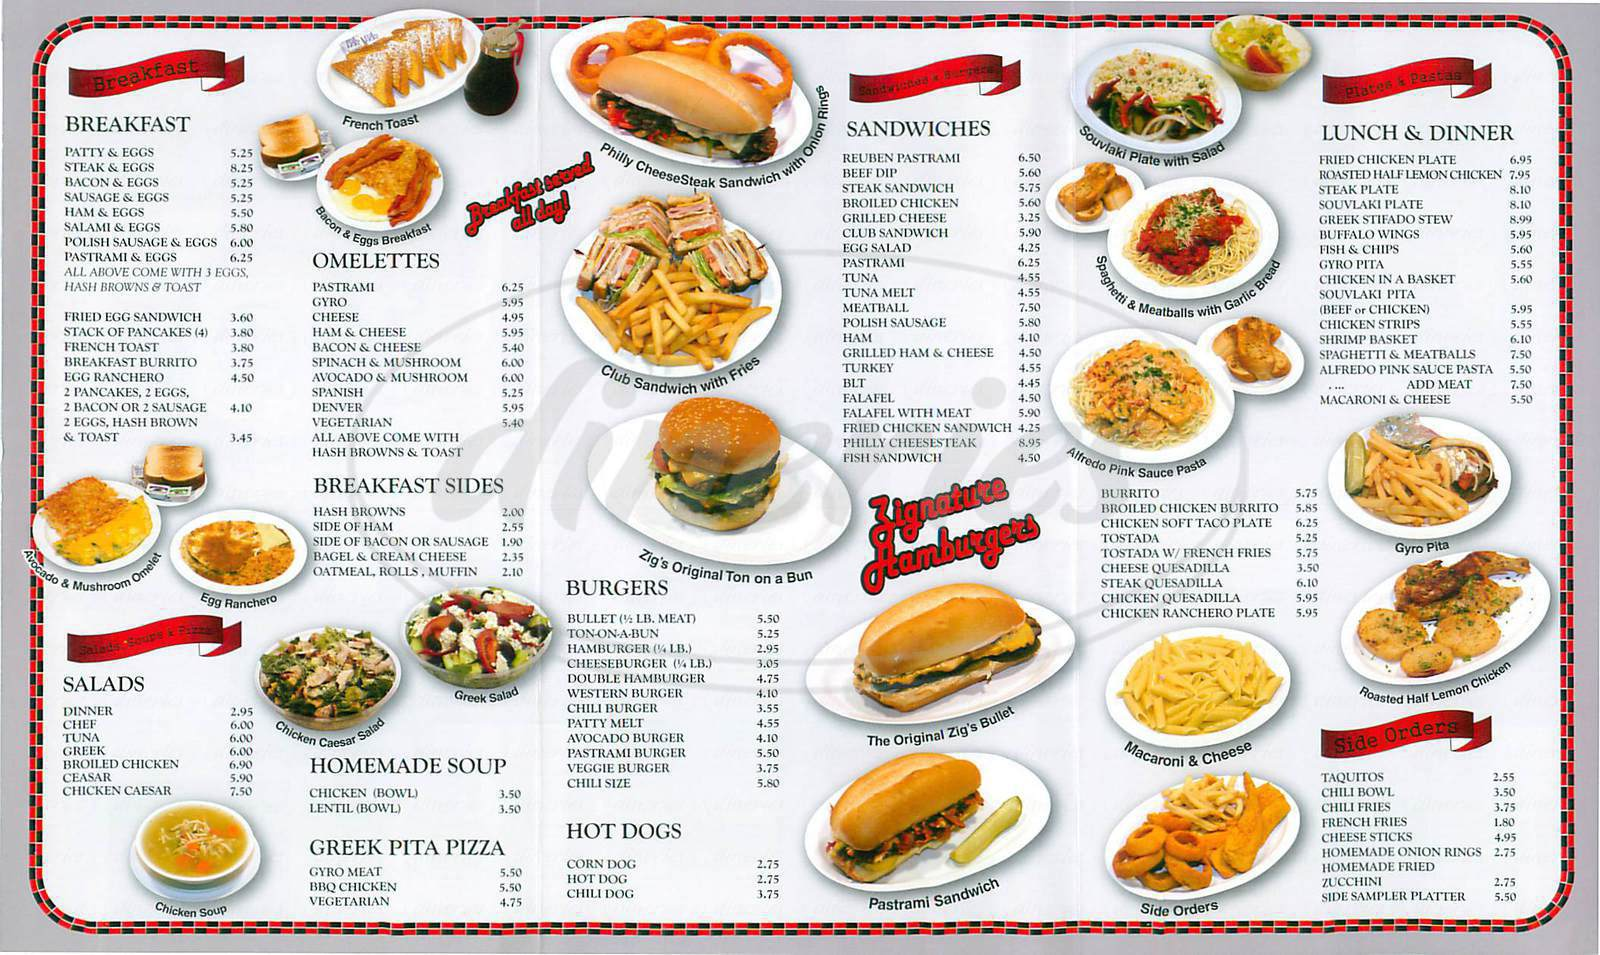 menu for Zigs Restaurant